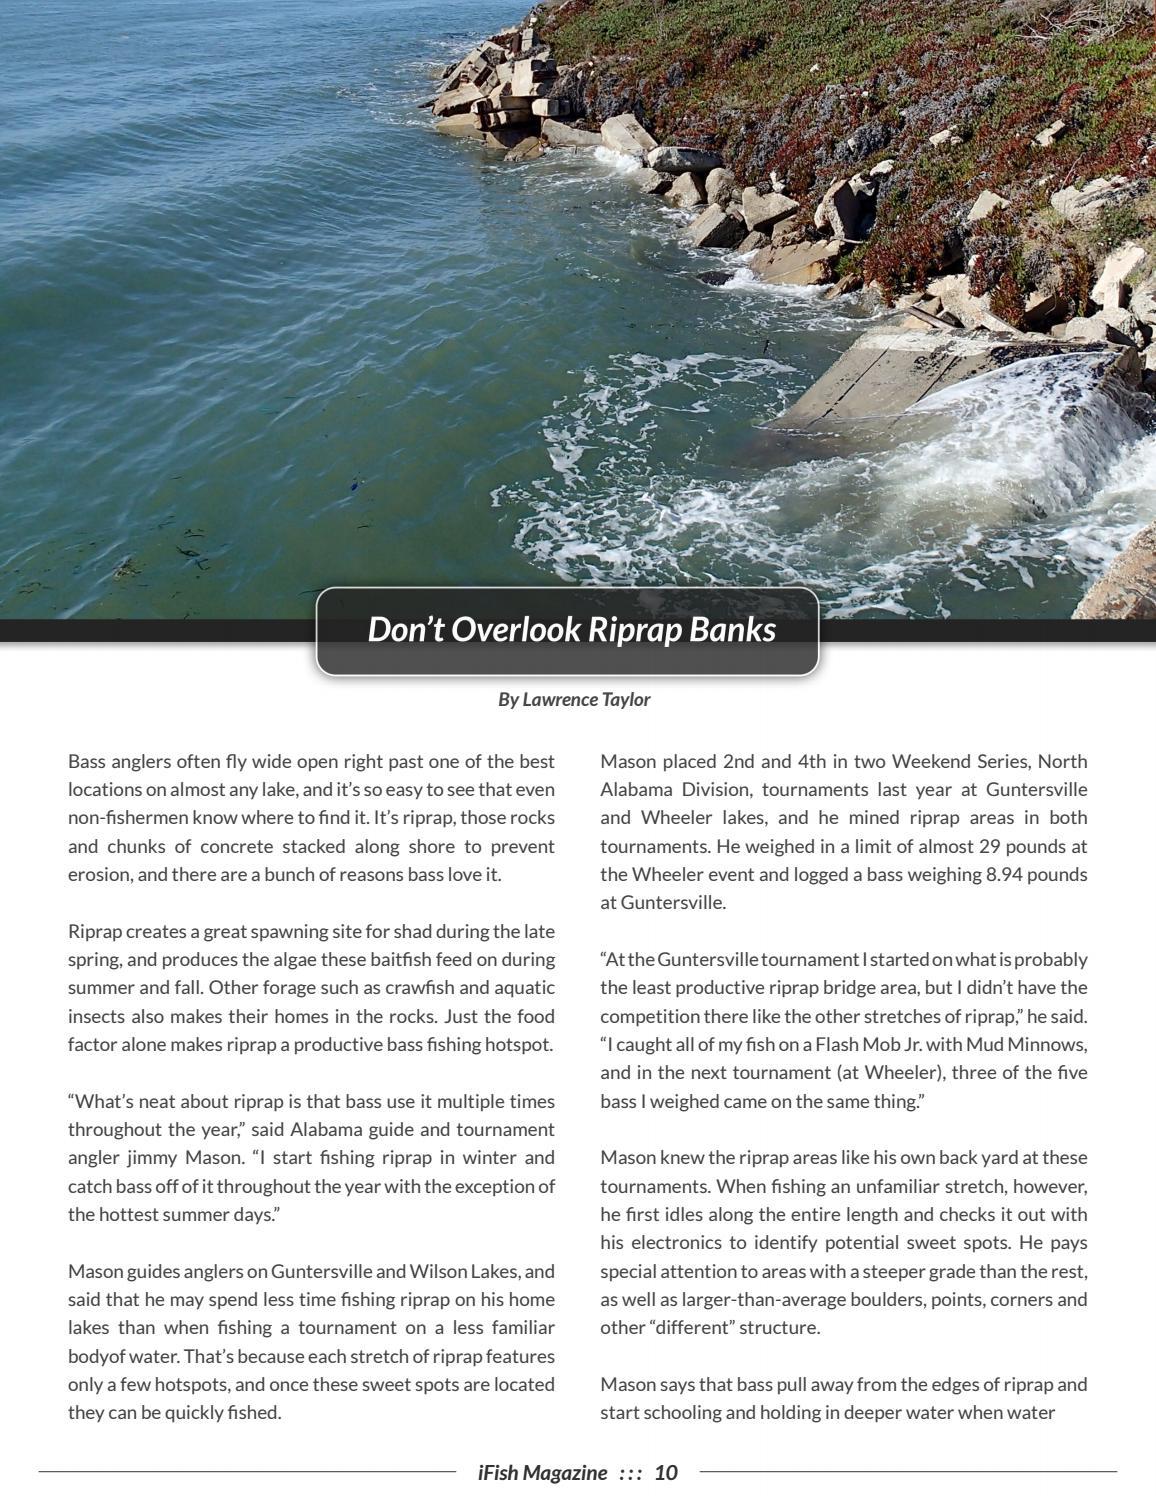 iFish Magazine - Summer 2014 Edition by iFish Magazine